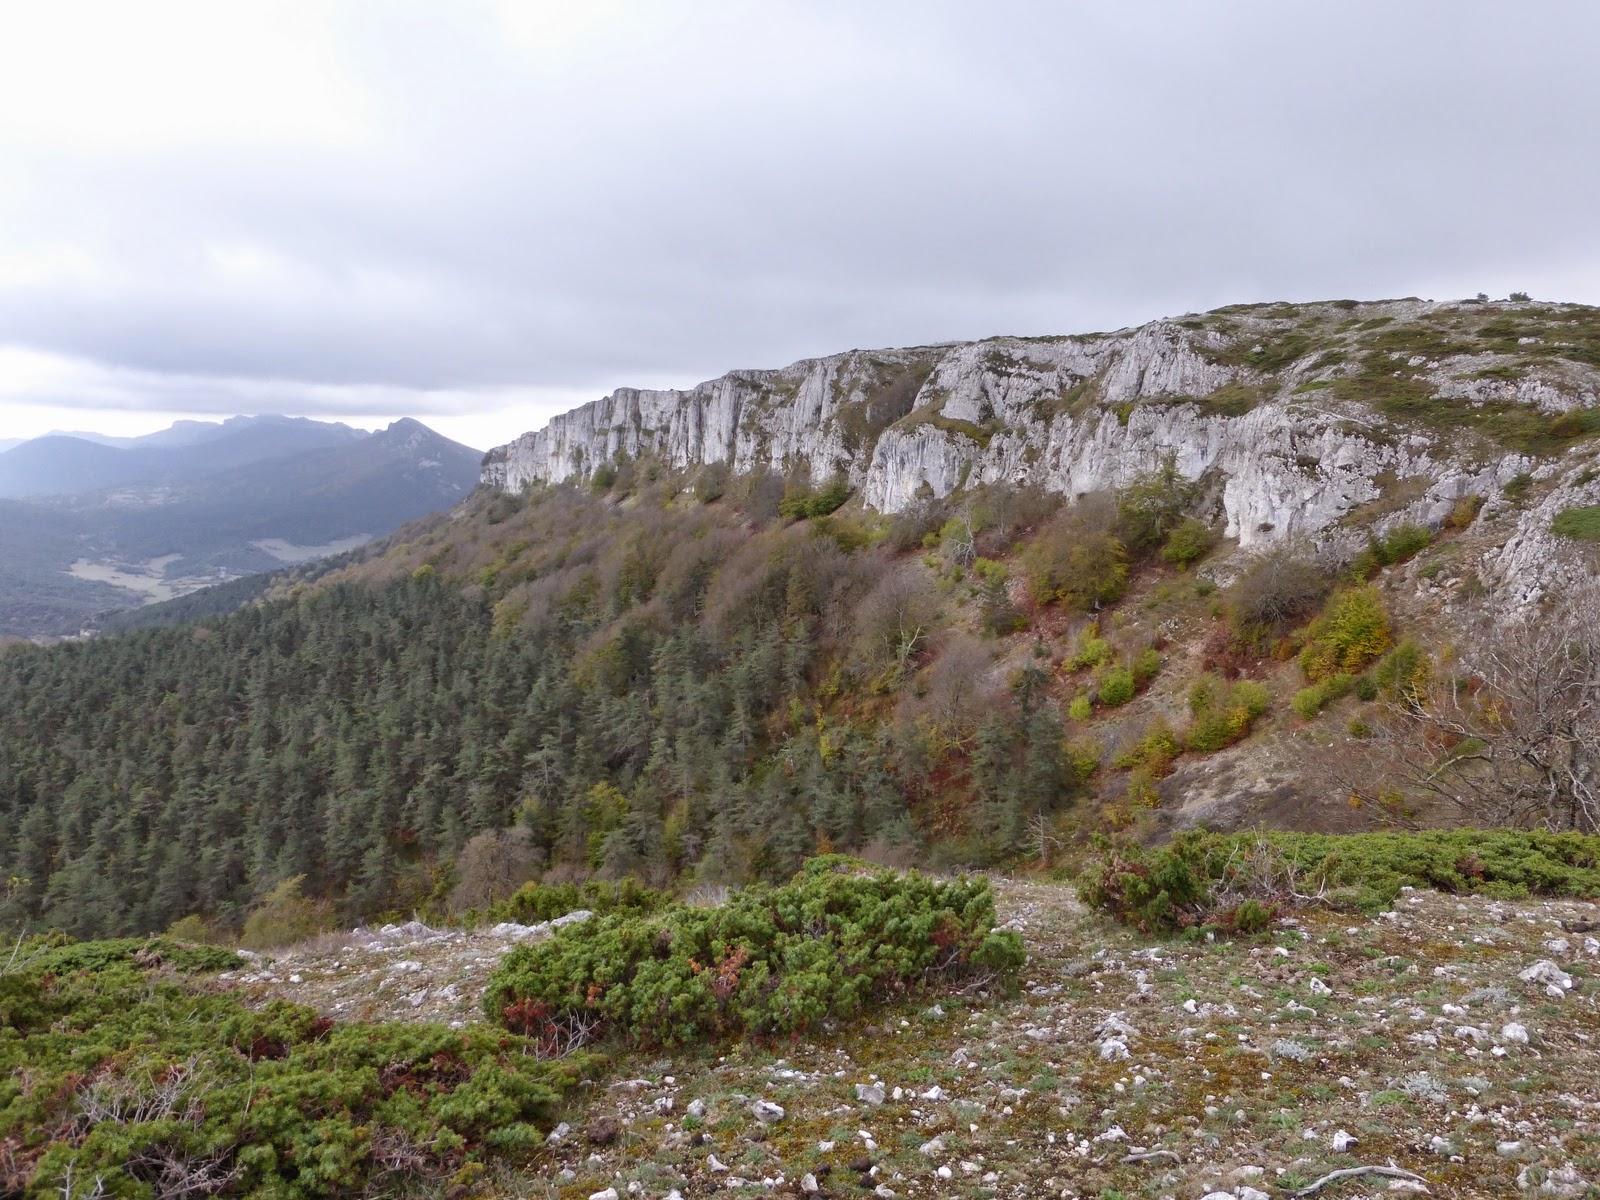 Valderejo, Vallegrull